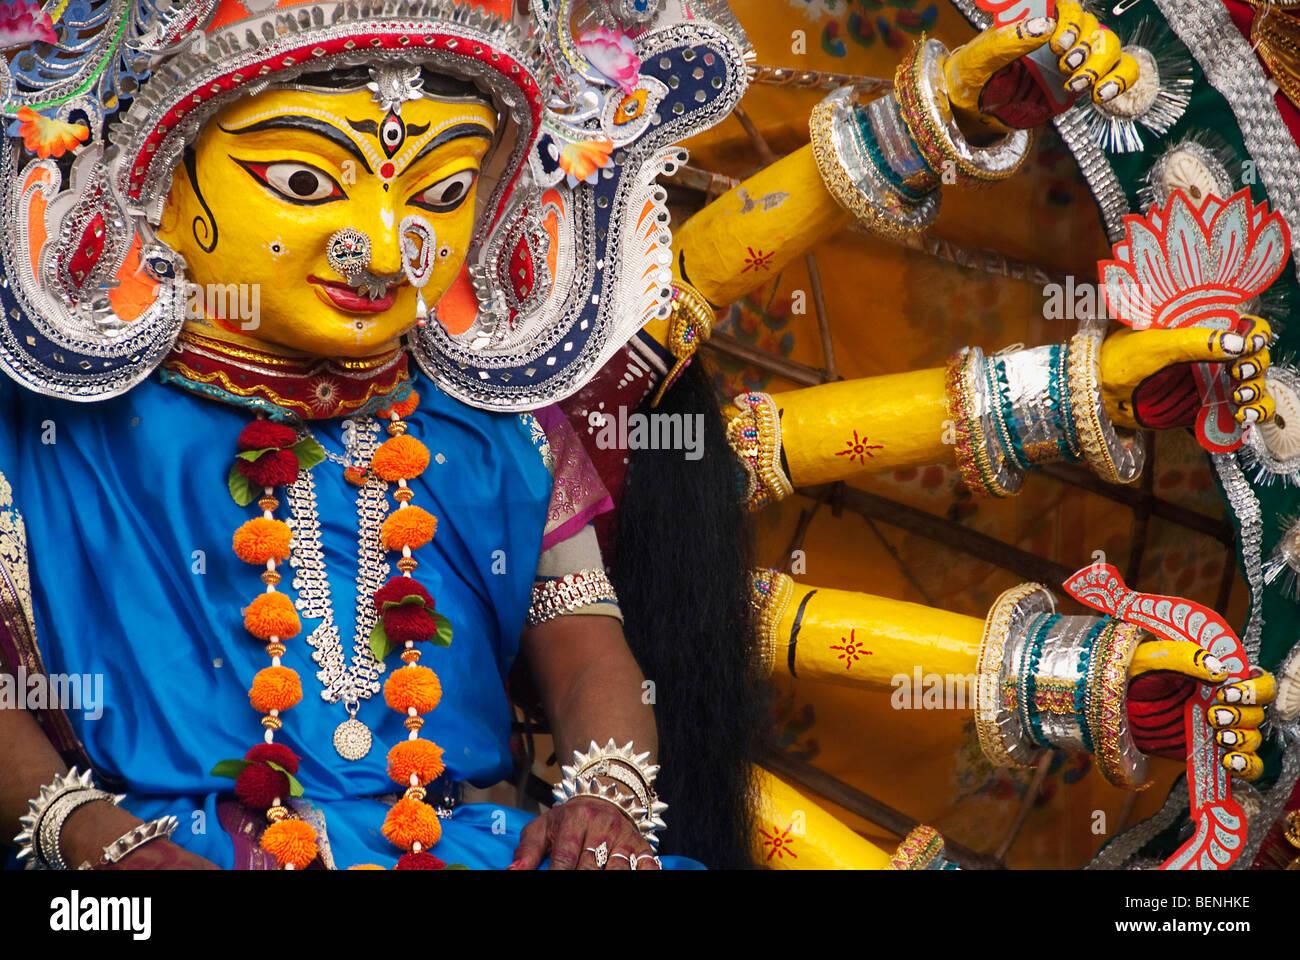 Rajasthani Woman Stock Photos & Rajasthani Woman Stock